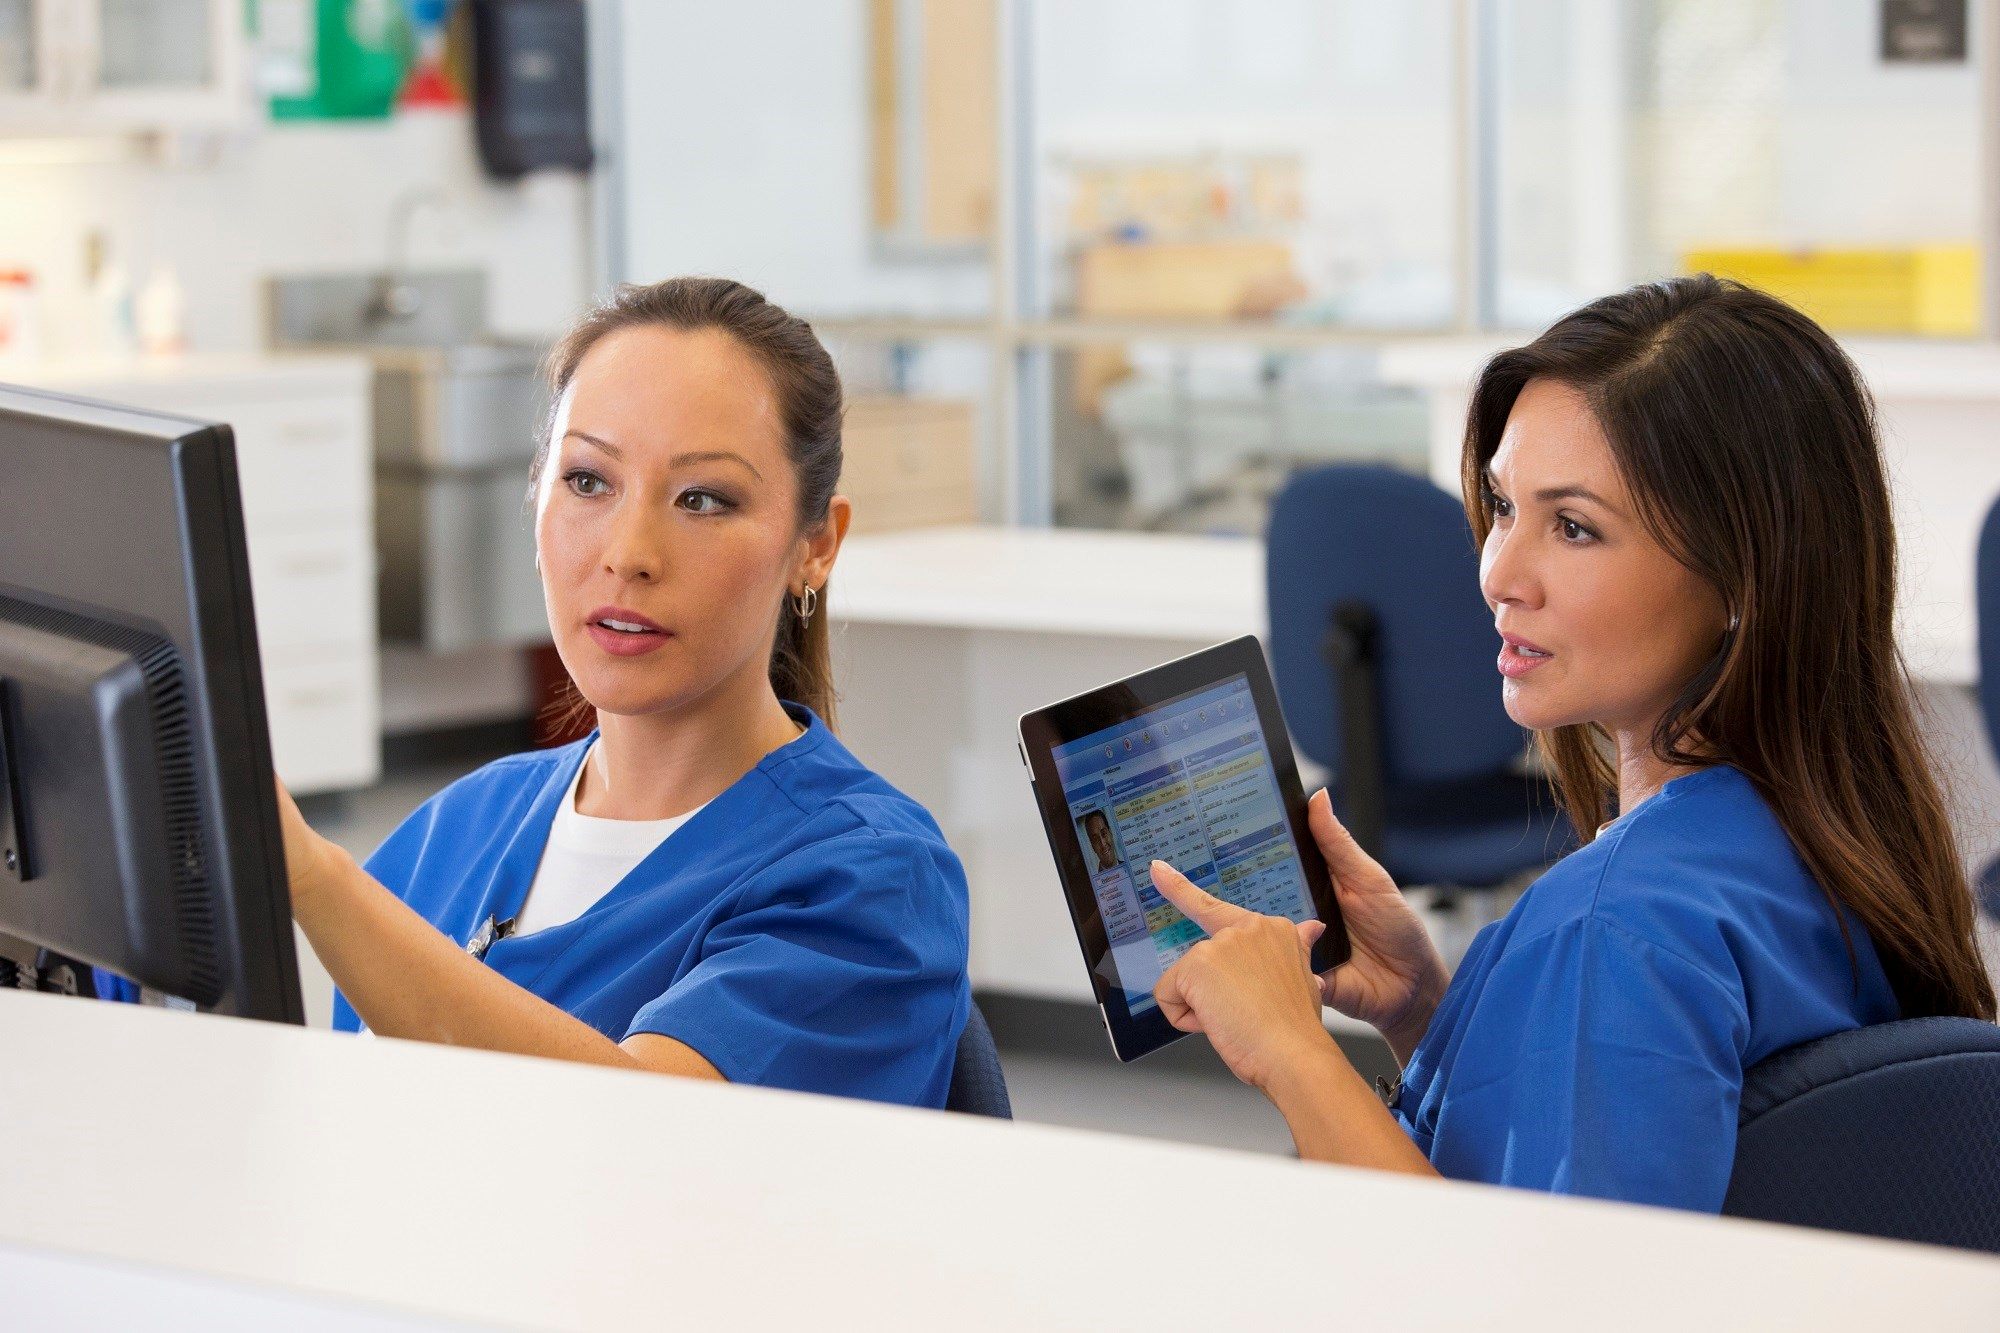 Nurses With Bachelor's Degree Feel More Prepared